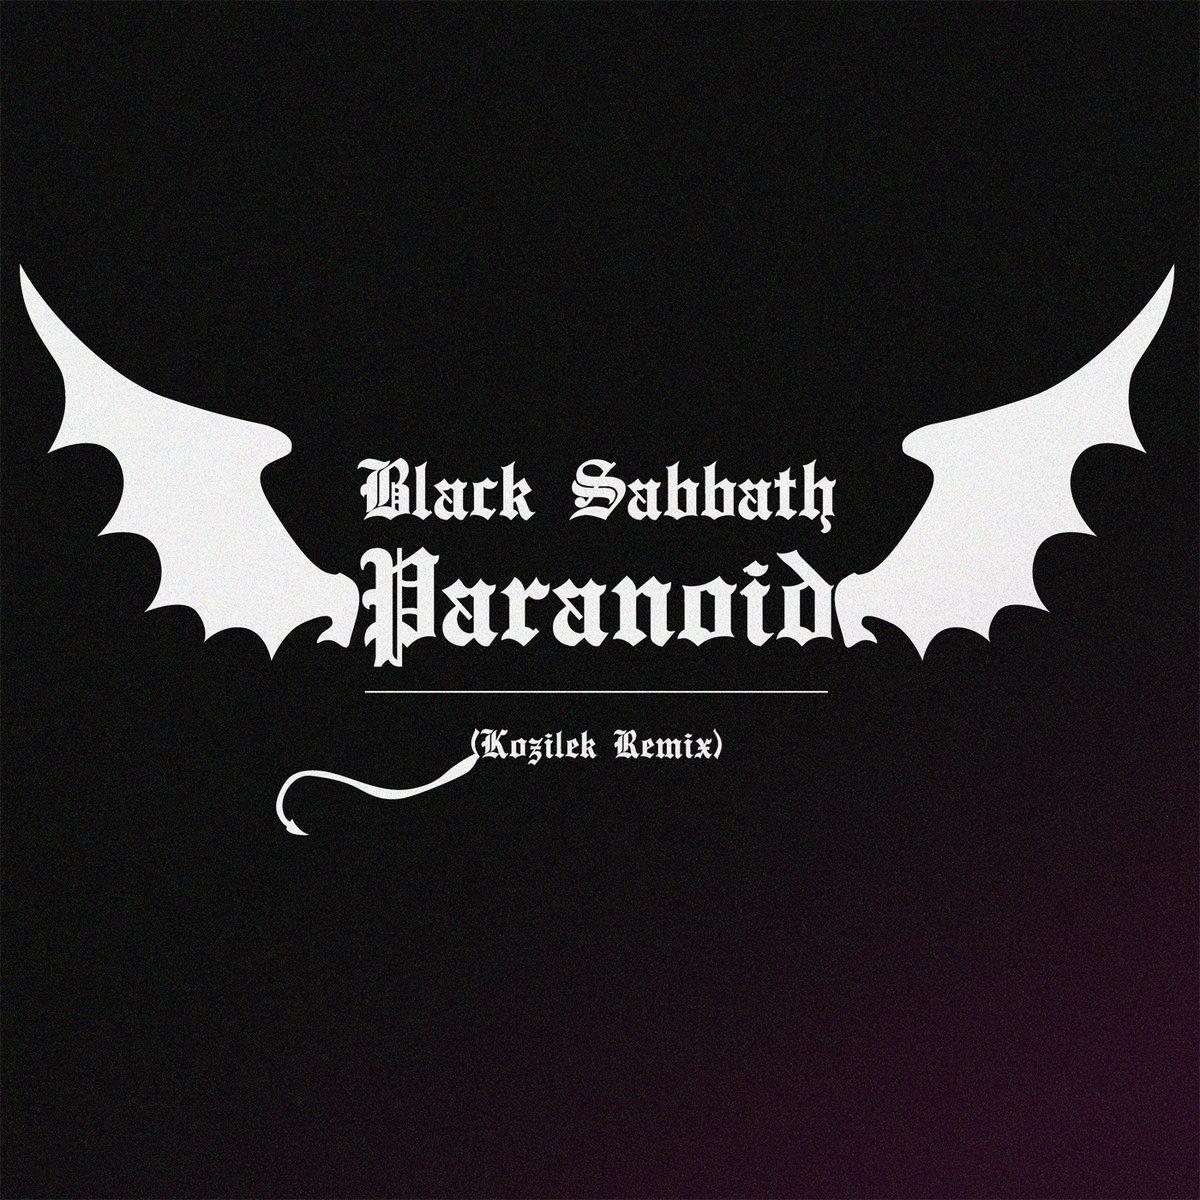 black sabbath discography free download